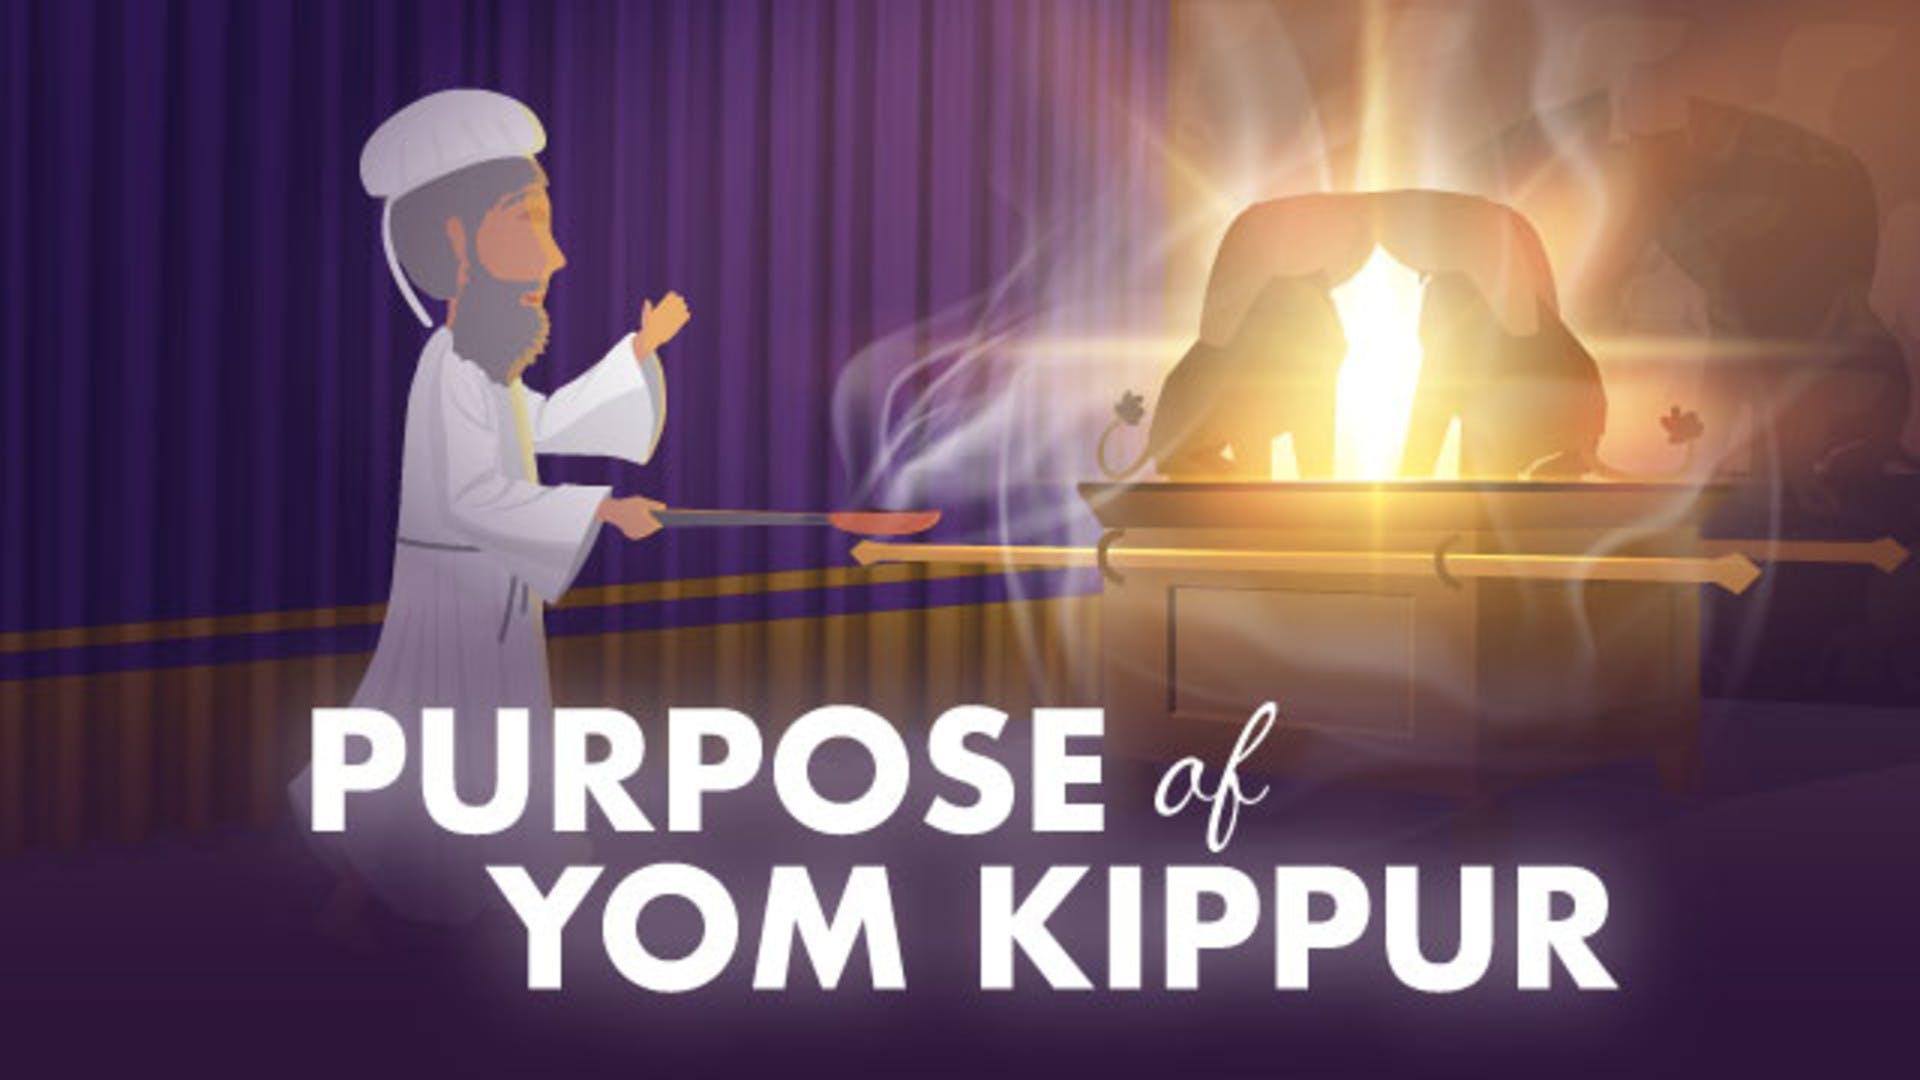 Yom Kippur forgiveness meaning purpose